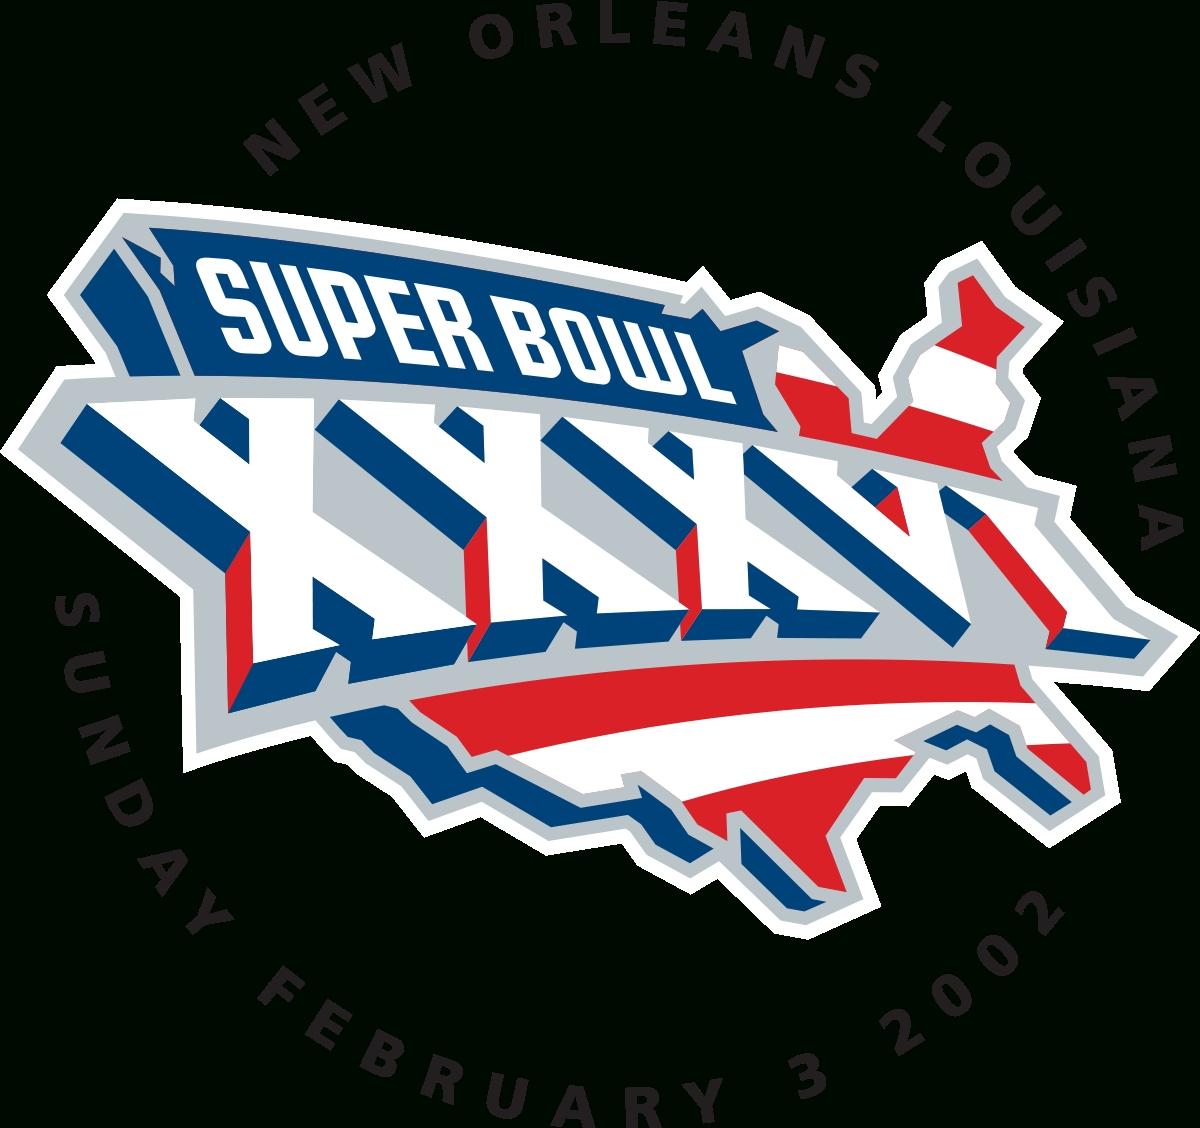 Super Bowl Xxxvi - Wikipedia regarding Super Bowls By Year